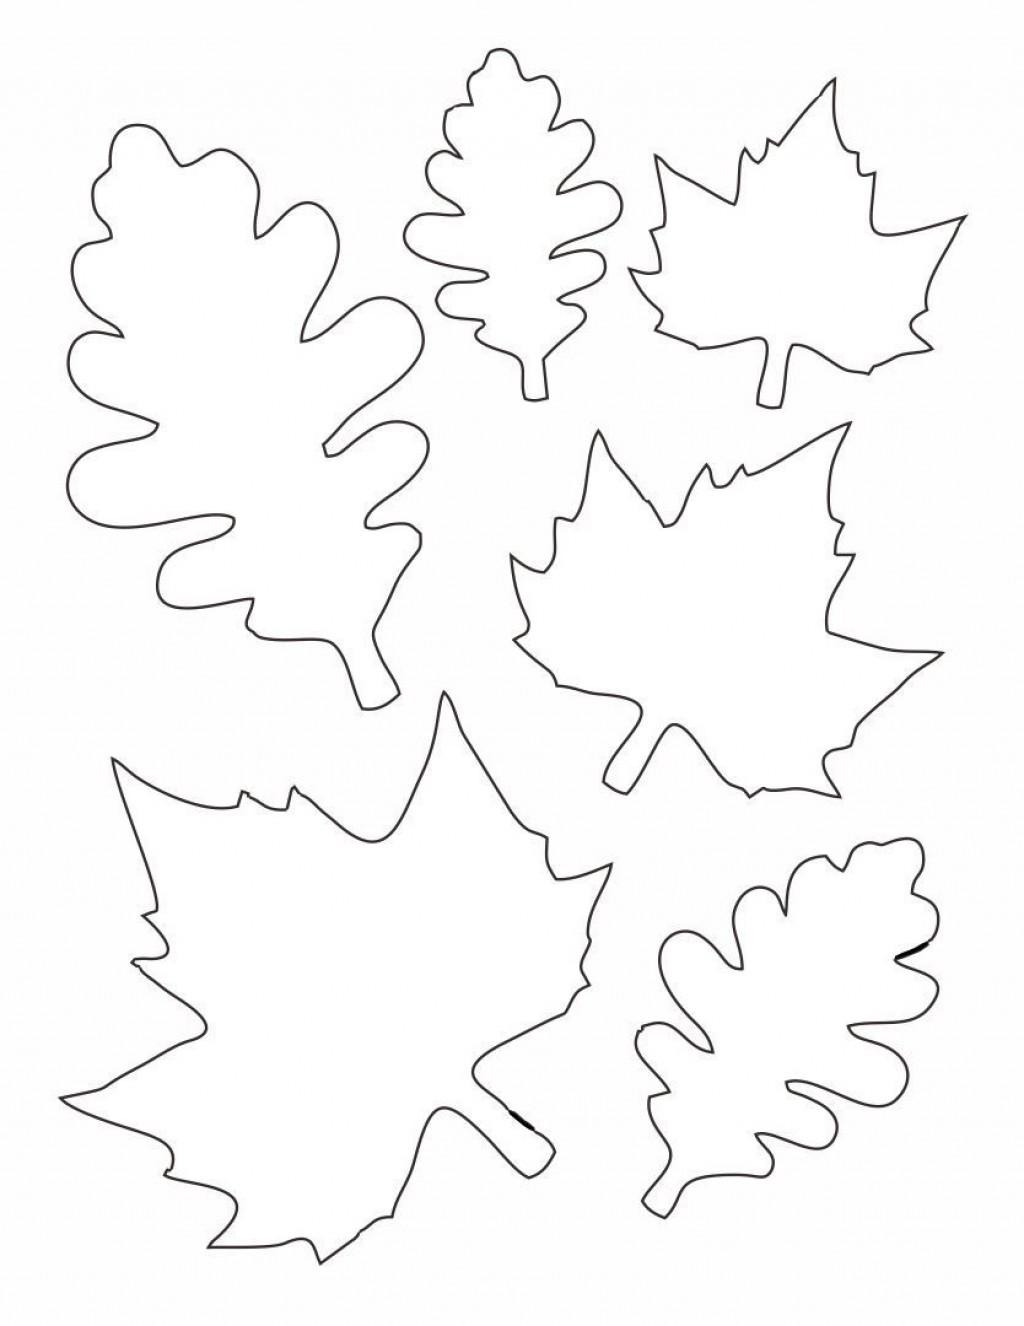 010 Unique Blank Leaf Template With Line Inspiration  Lines PrintableLarge